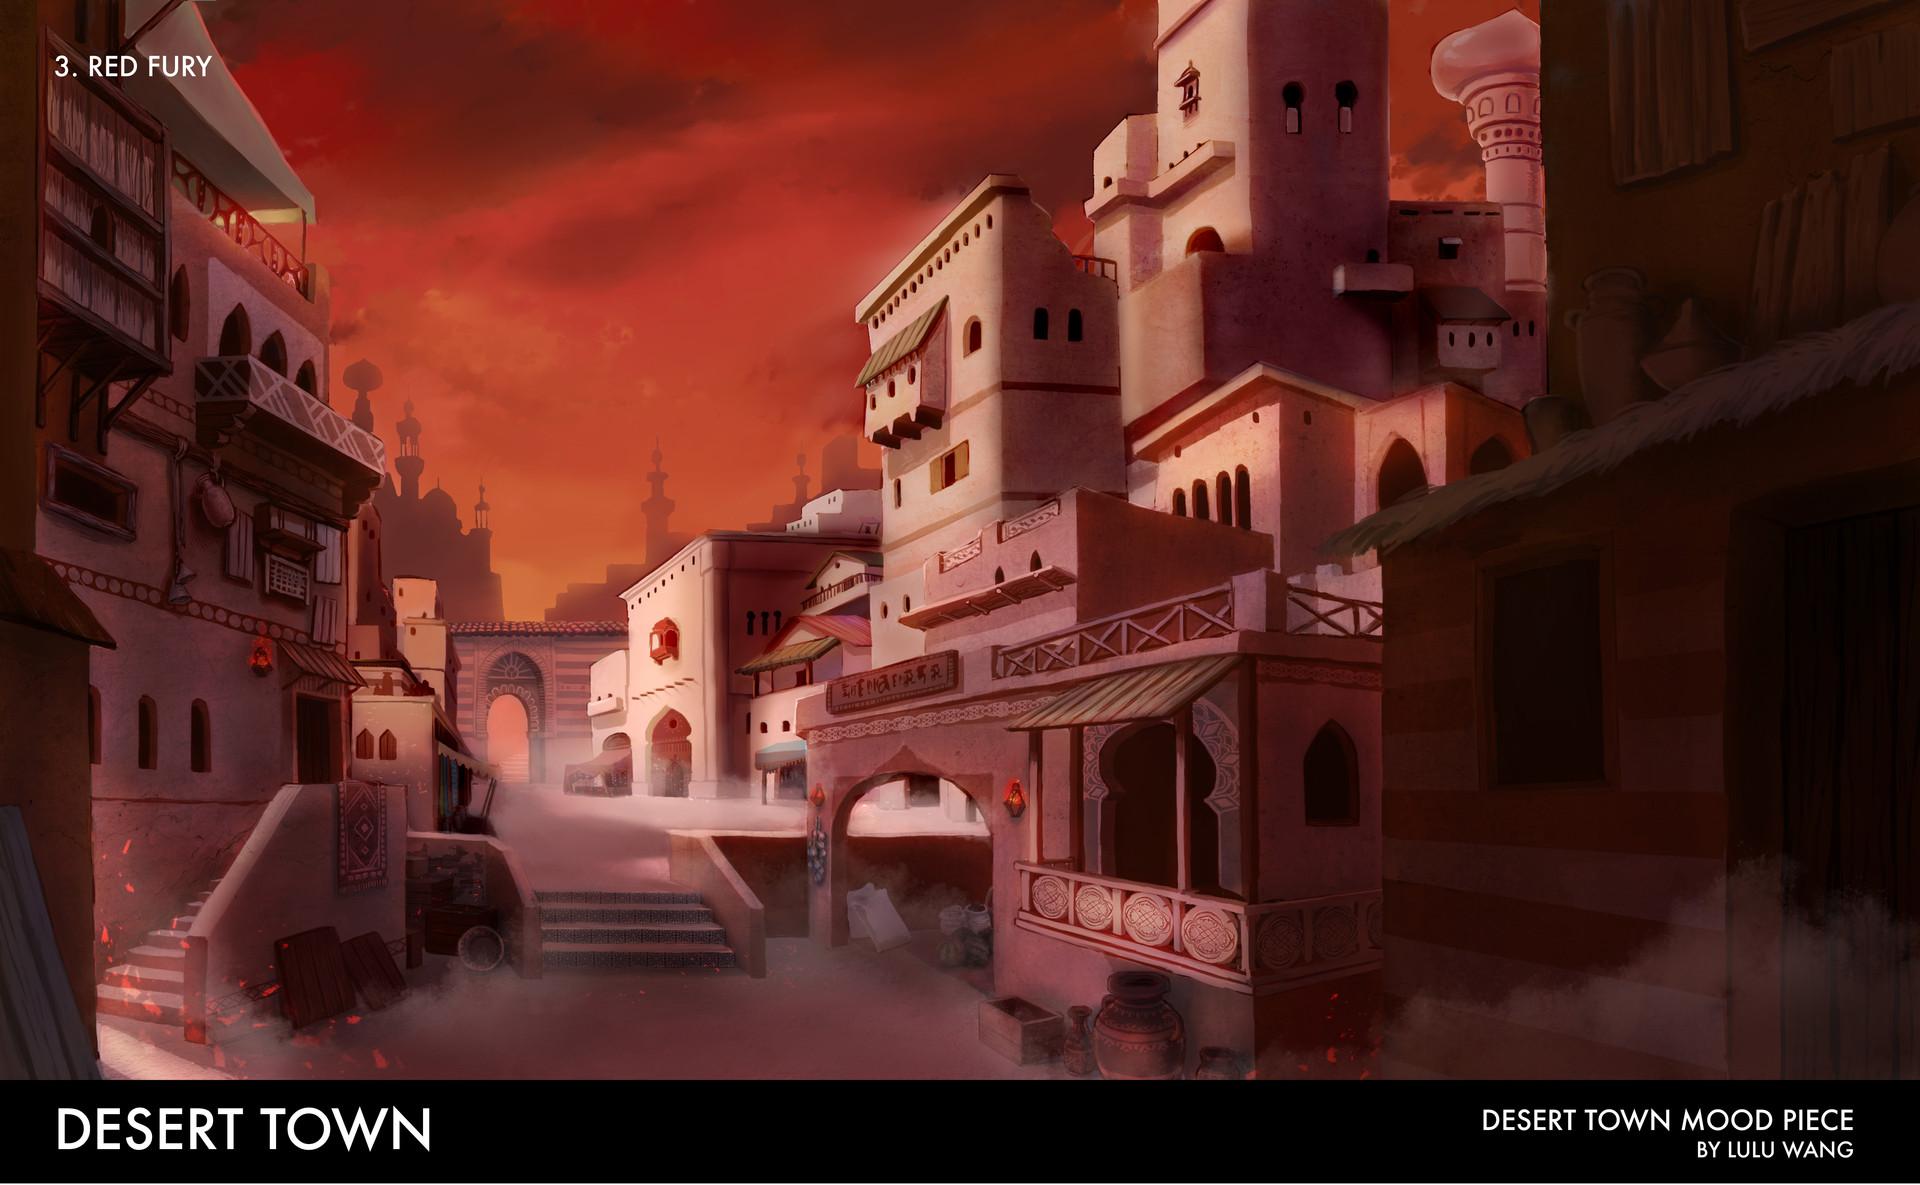 deserttowncallouts3.jpg